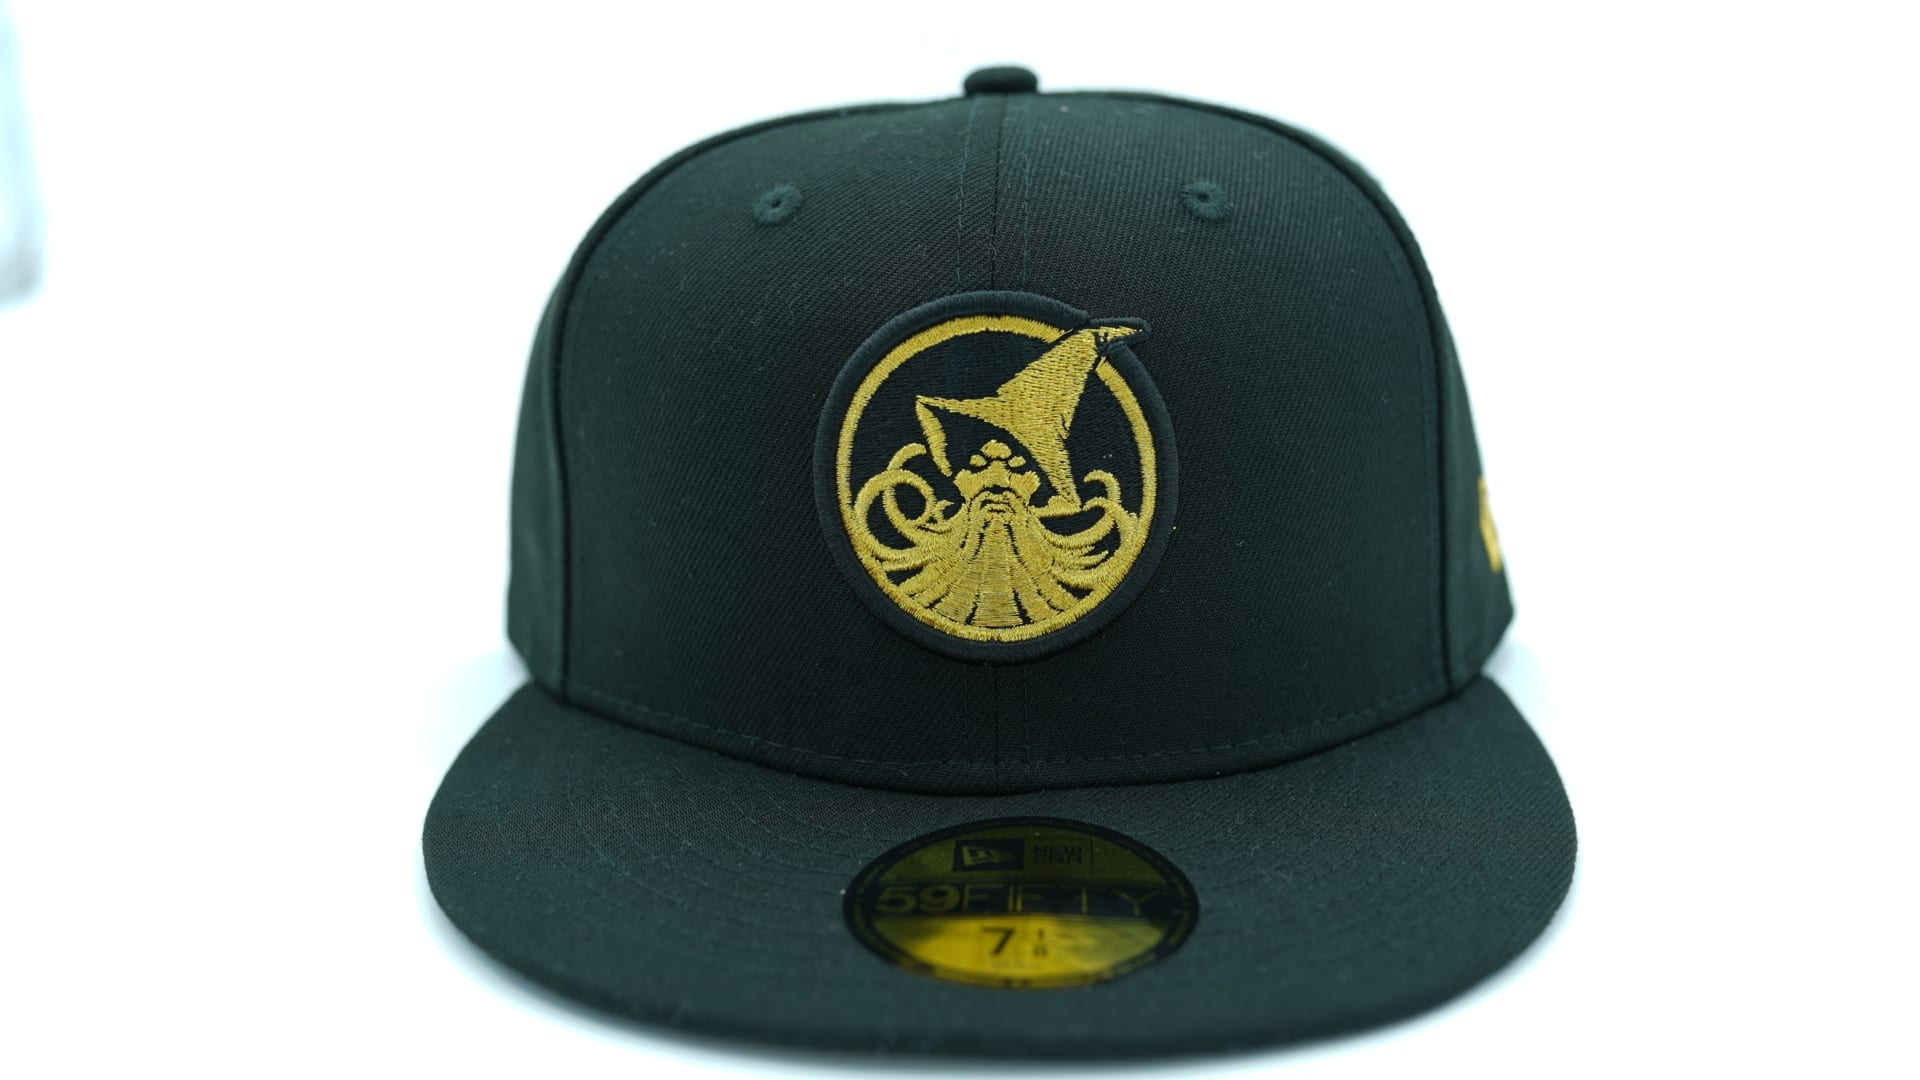 new-era-mlb-kansas-city-athletics-59fifty-fitted-baseball-cap.jpg